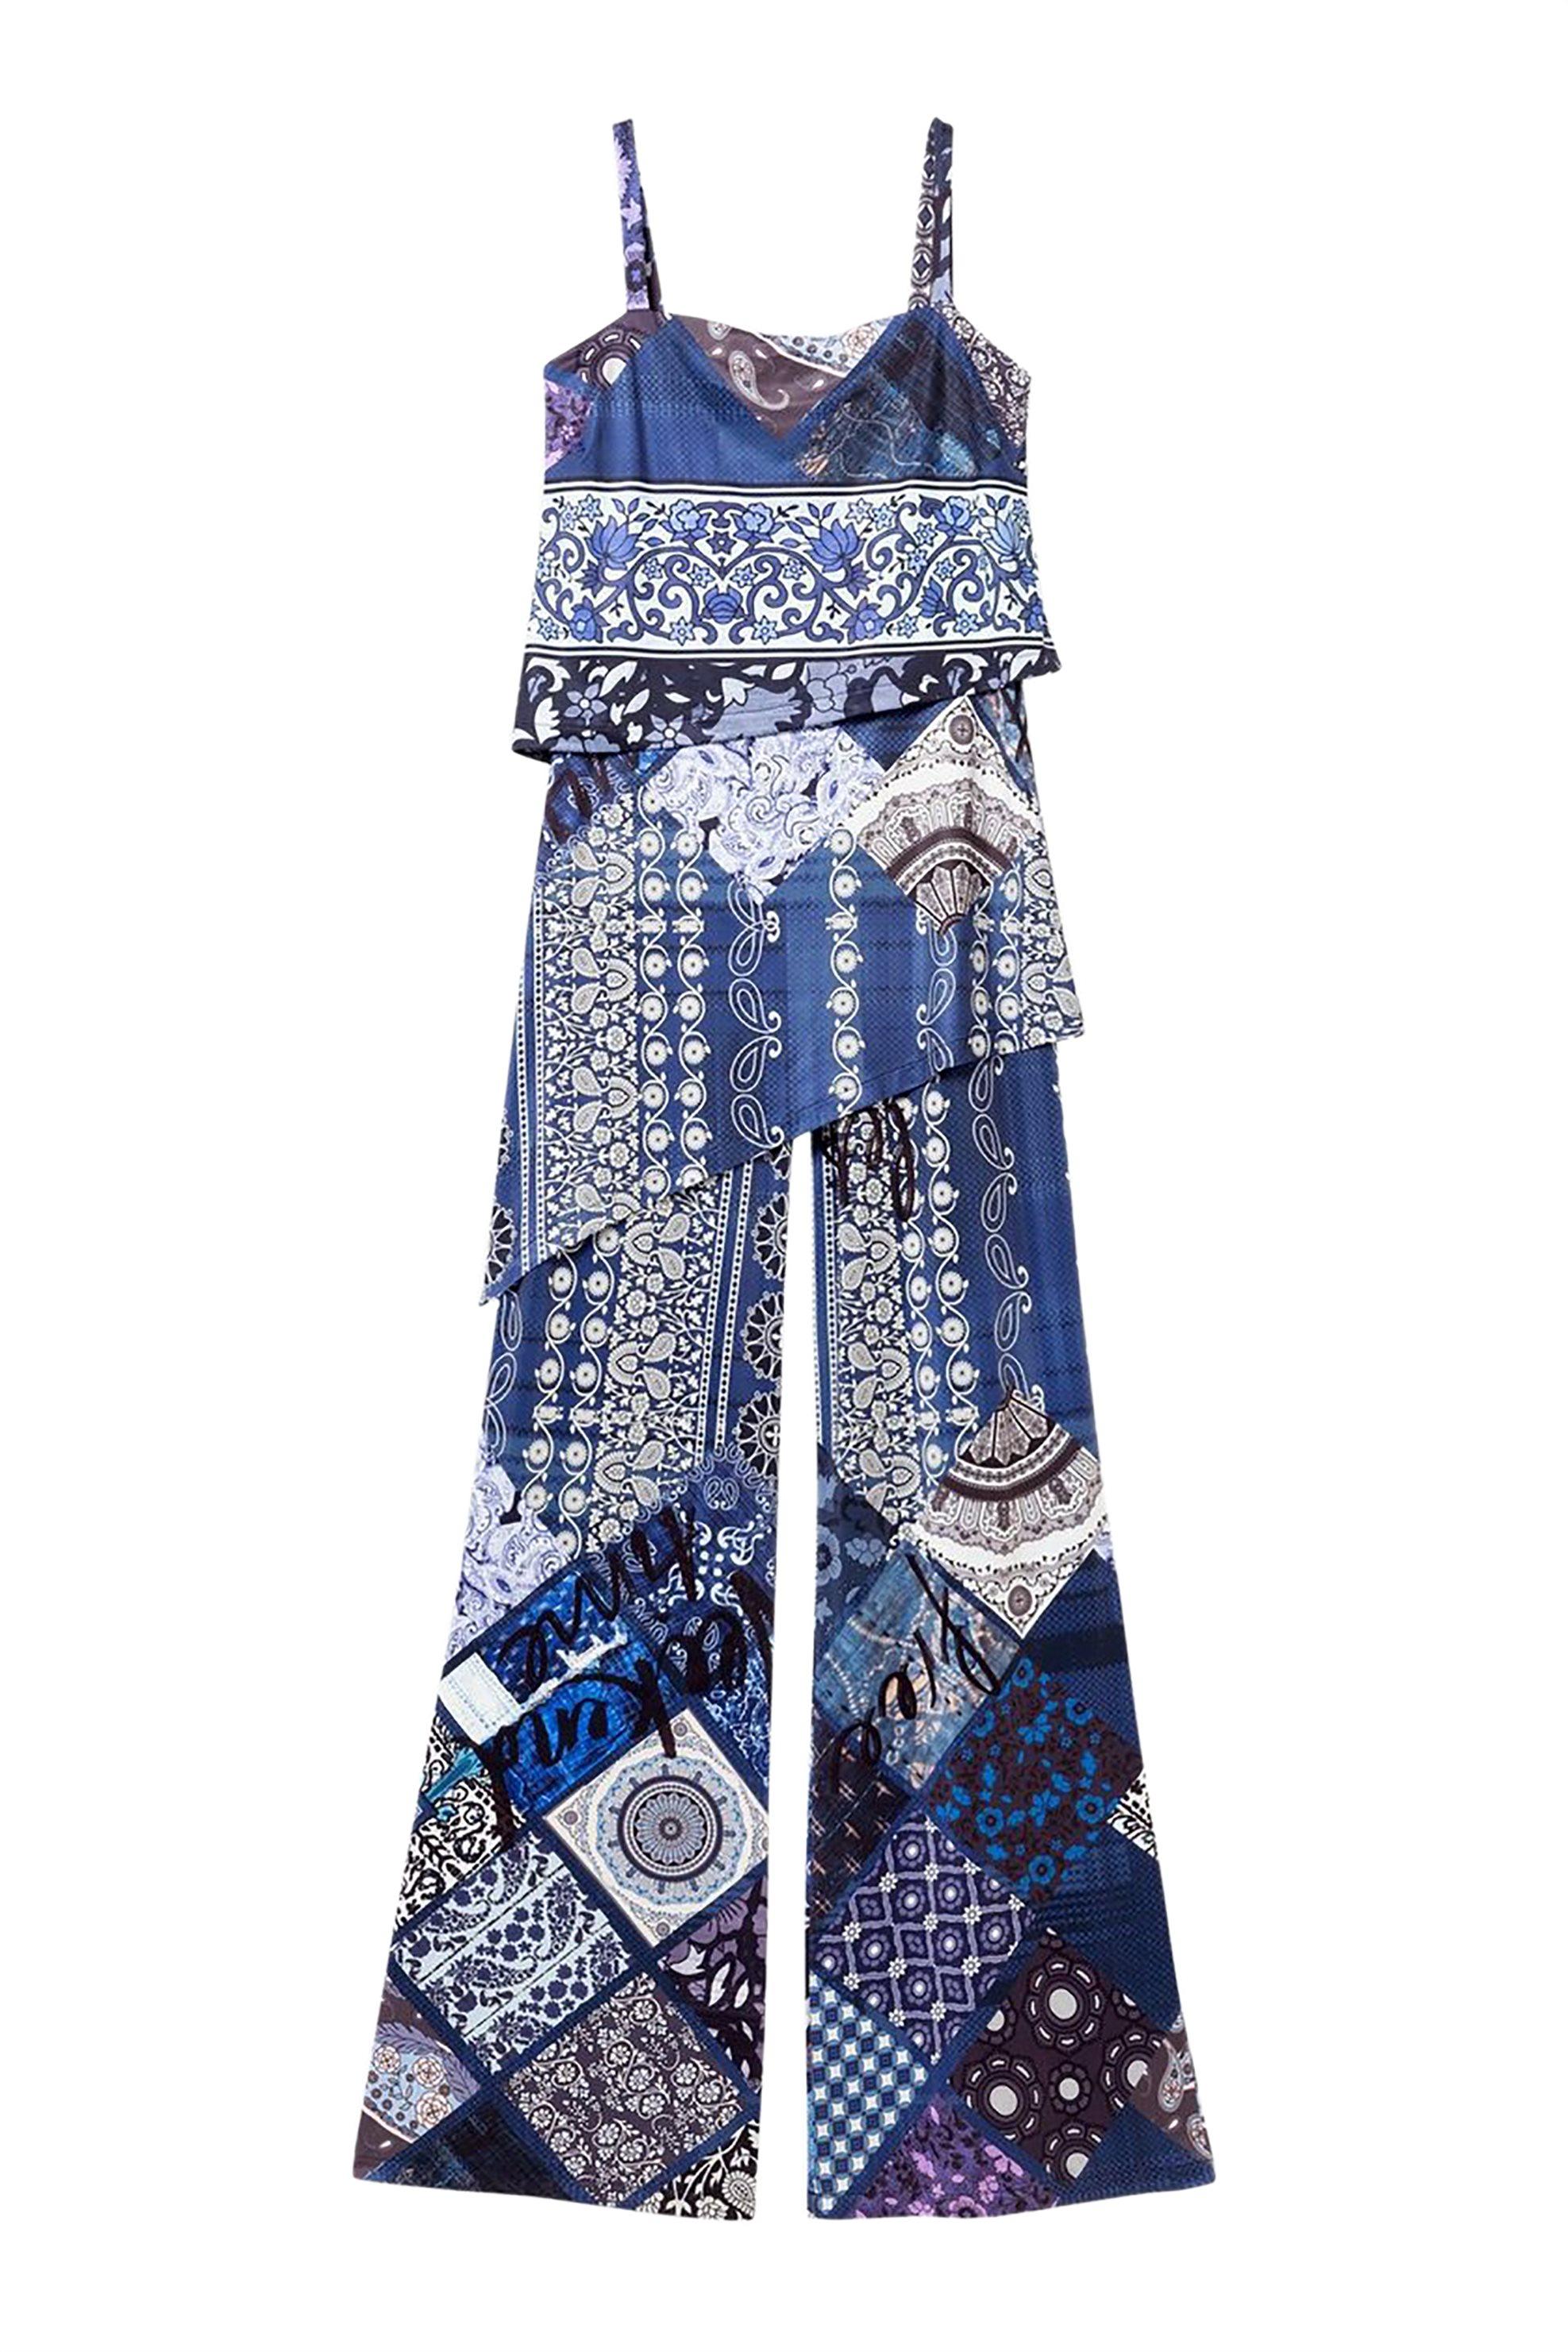 Desigual γυναικεία ολόσωμη φόρμα εμπριμέ Candice - 19SWPK10 - Μπλε γυναικα   ρουχα   ολόσωμες φόρμες   σαλοπέτες